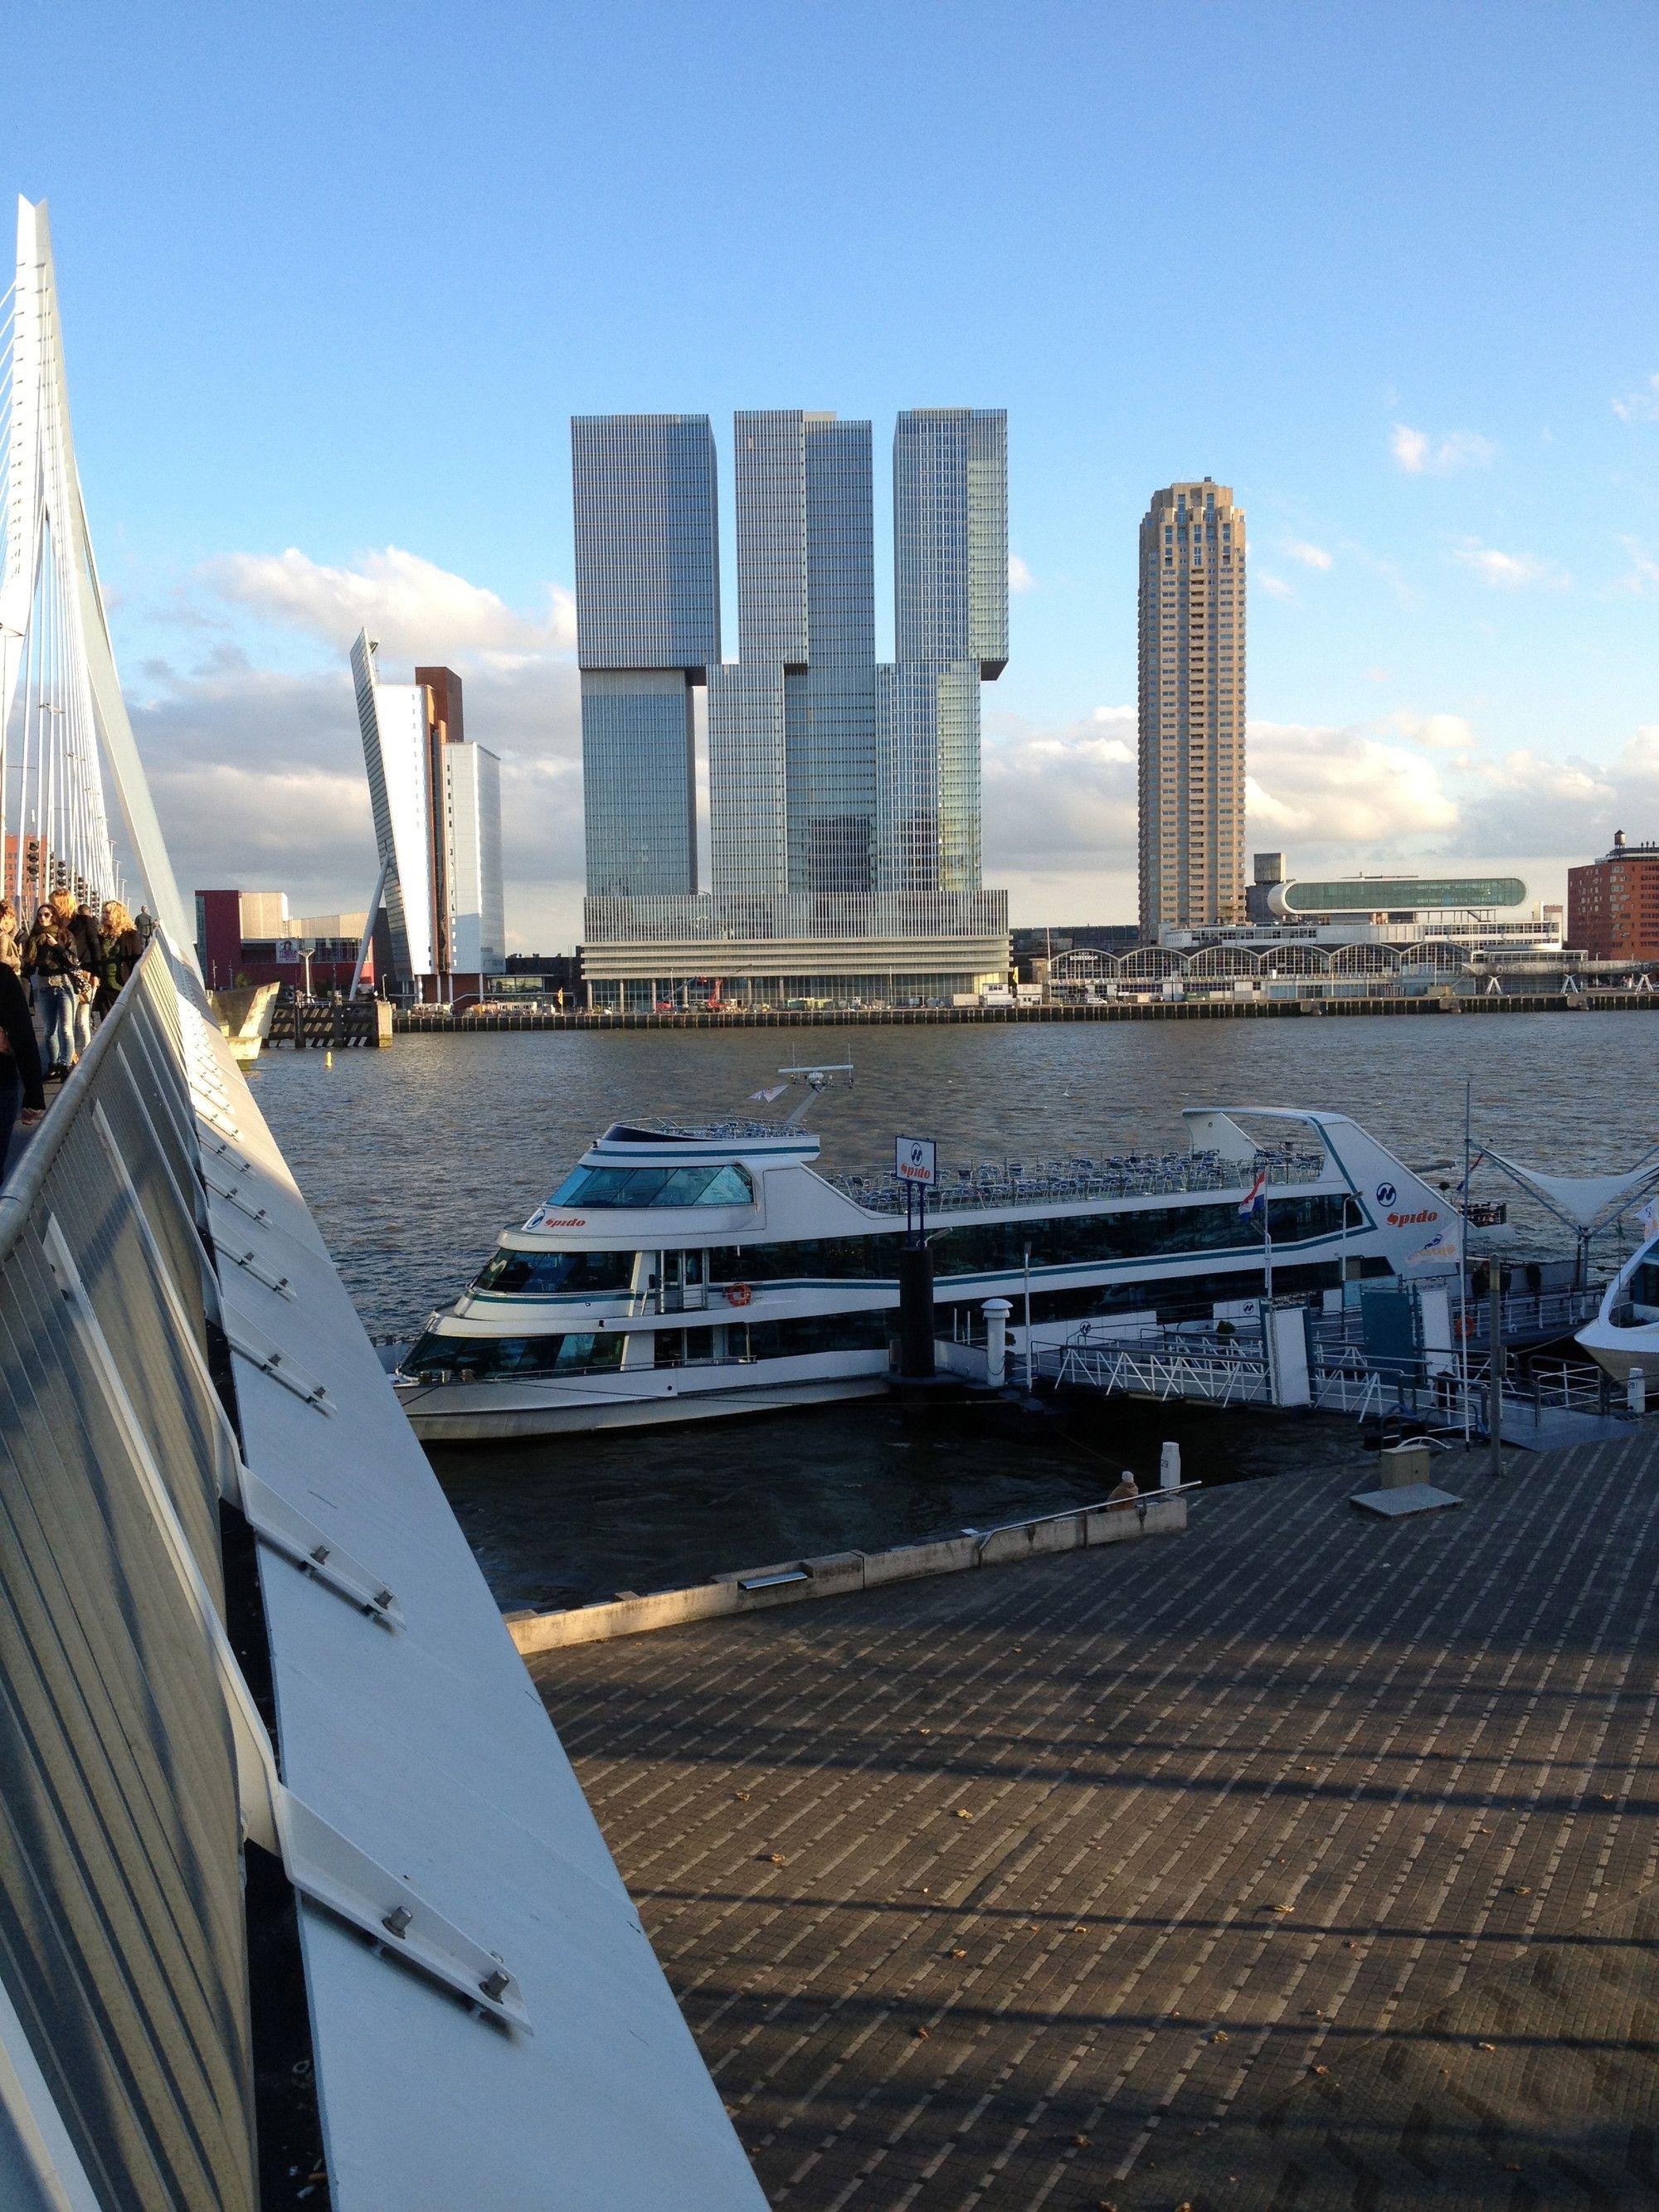 Gallery - De Rotterdam / OMA - 14